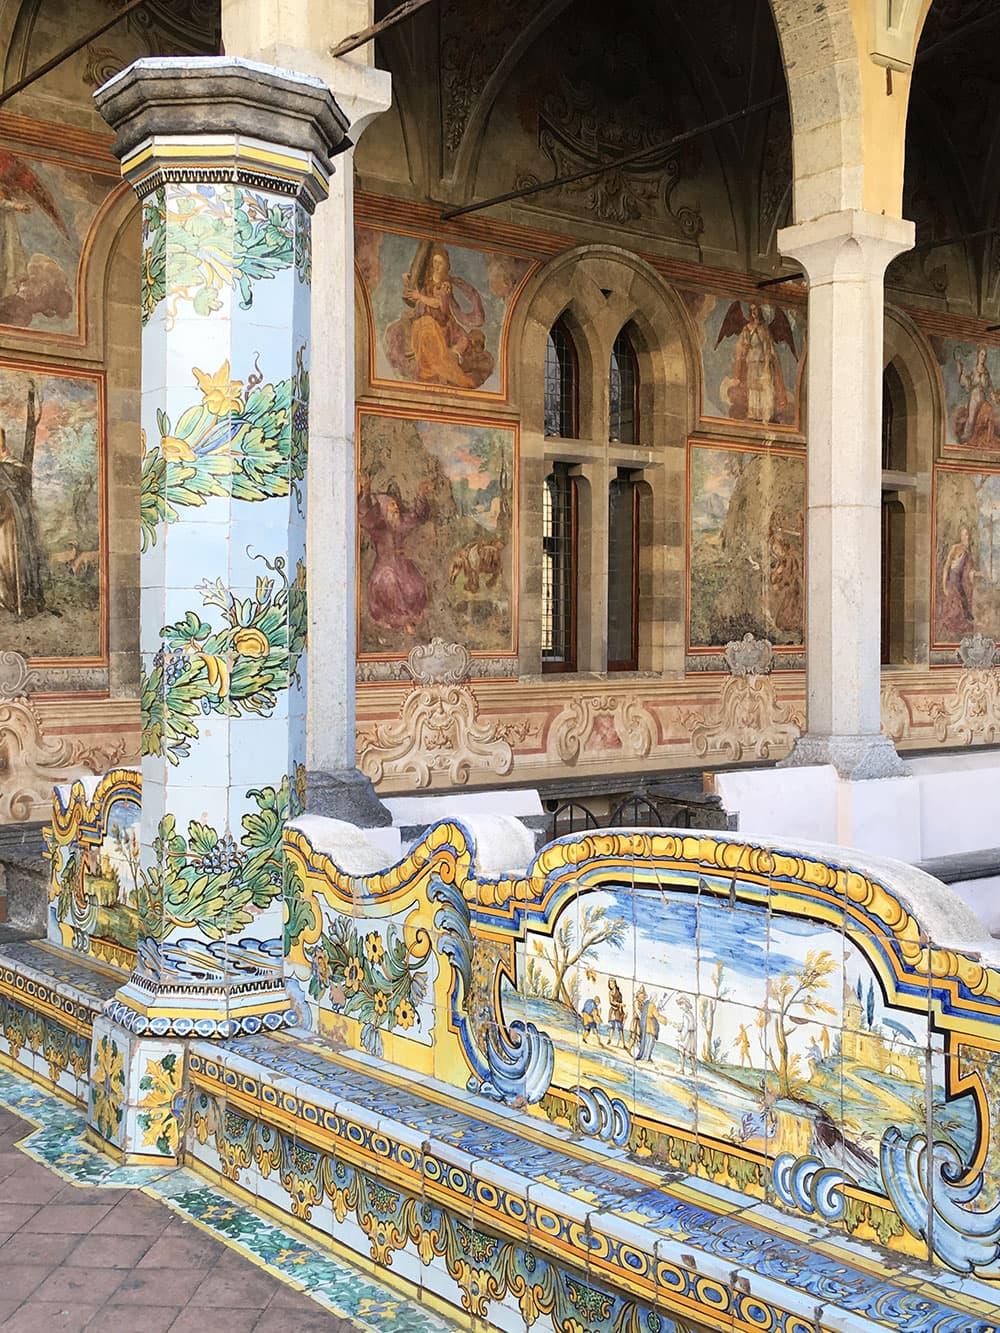 Wall fresco at Santa Chiara courtyard